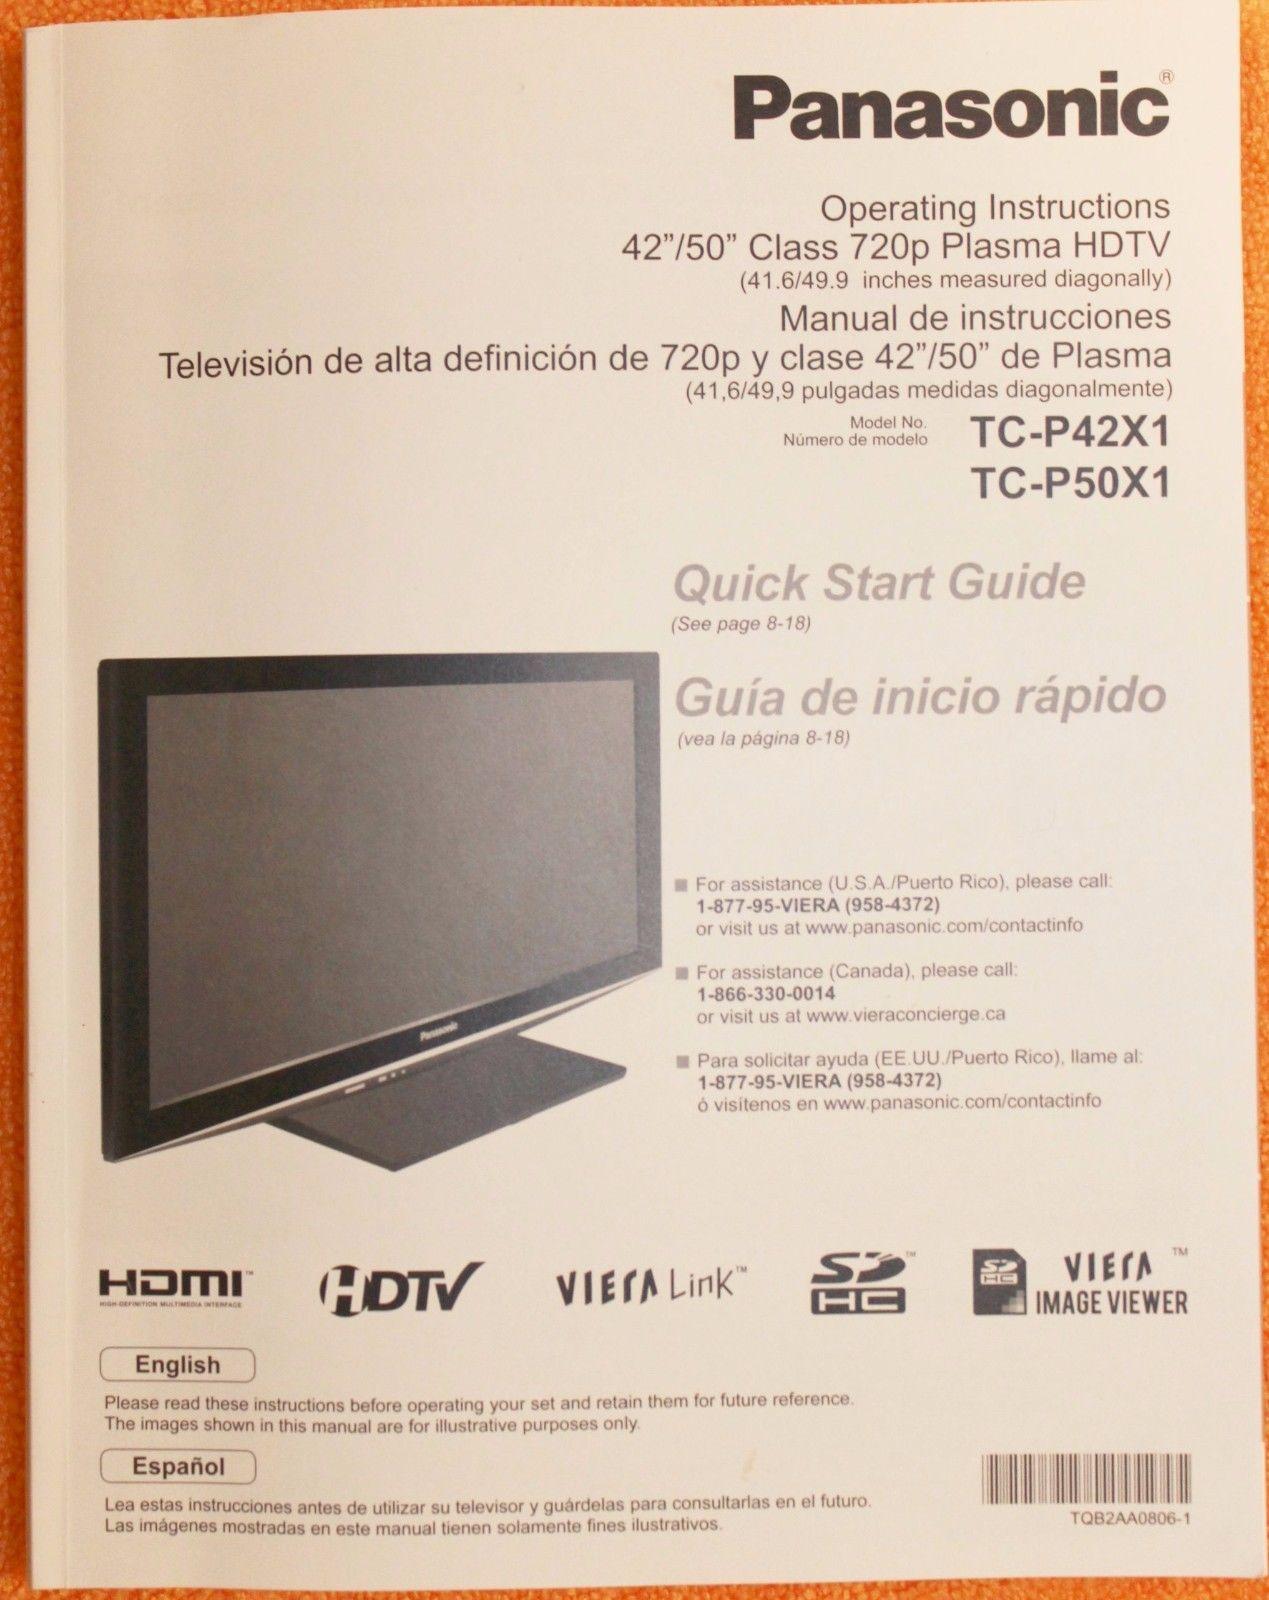 panasonic tc p50x1 tc p42x1 operating and similar items rh bonanza com tc-p50x1 manual tc-p50x1 manual pdf